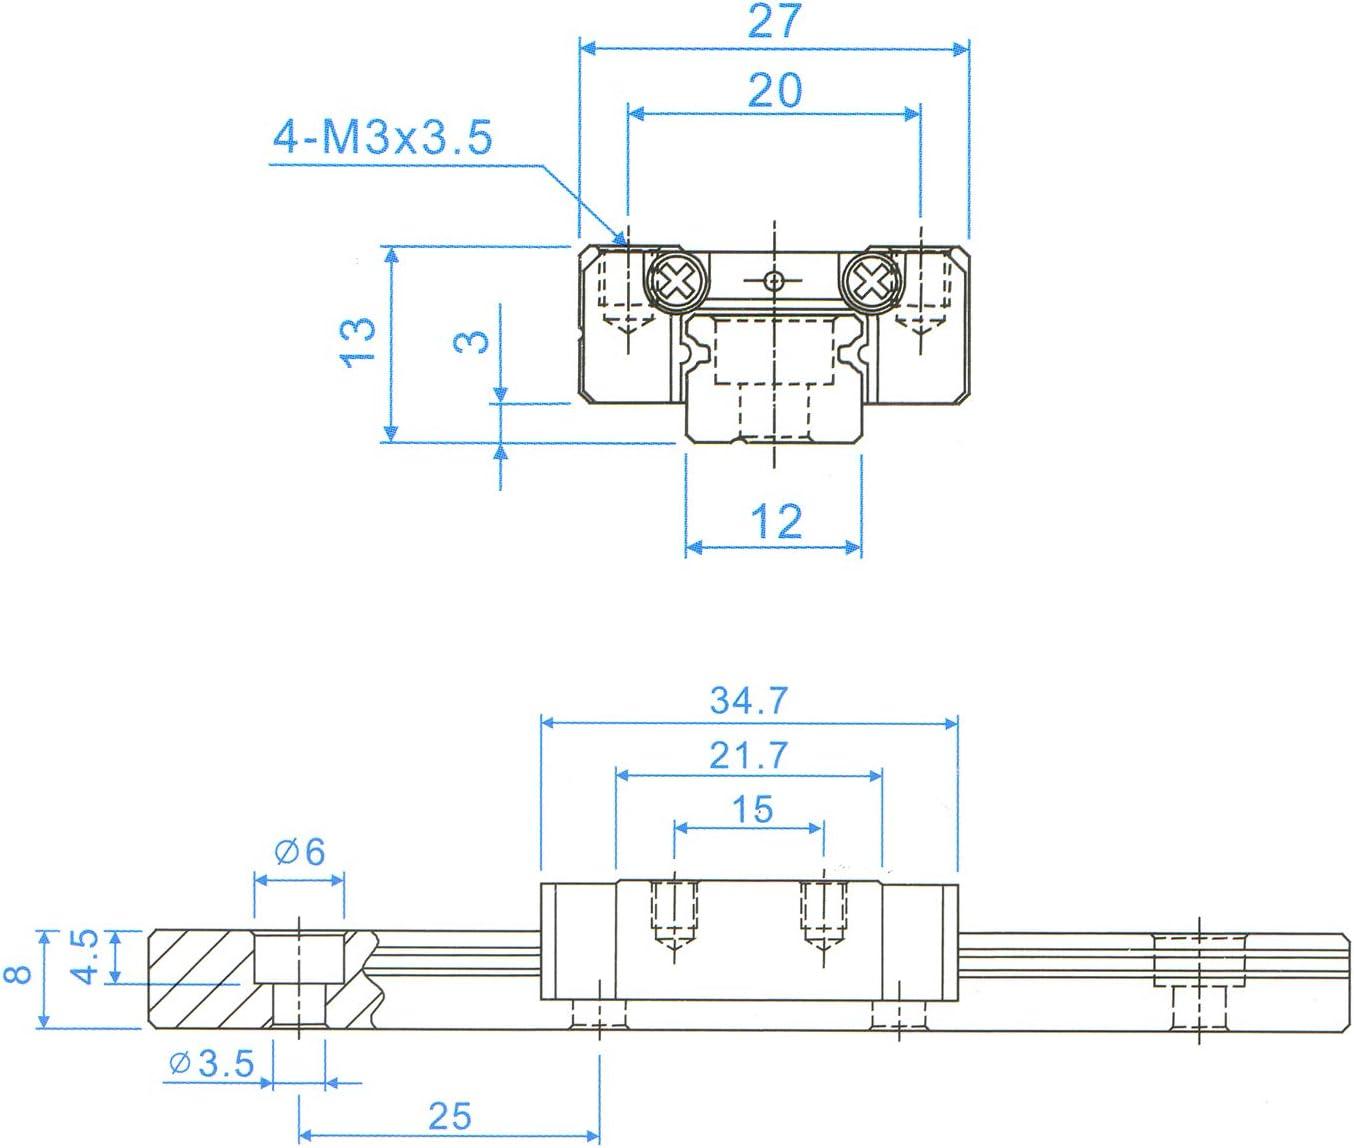 Usongshine MGN12 Linear Rail Guide with MGN12C Linear Bearing Sliding Block Match for CNC xyz DIY Engraving Machine 350mm, C-Type